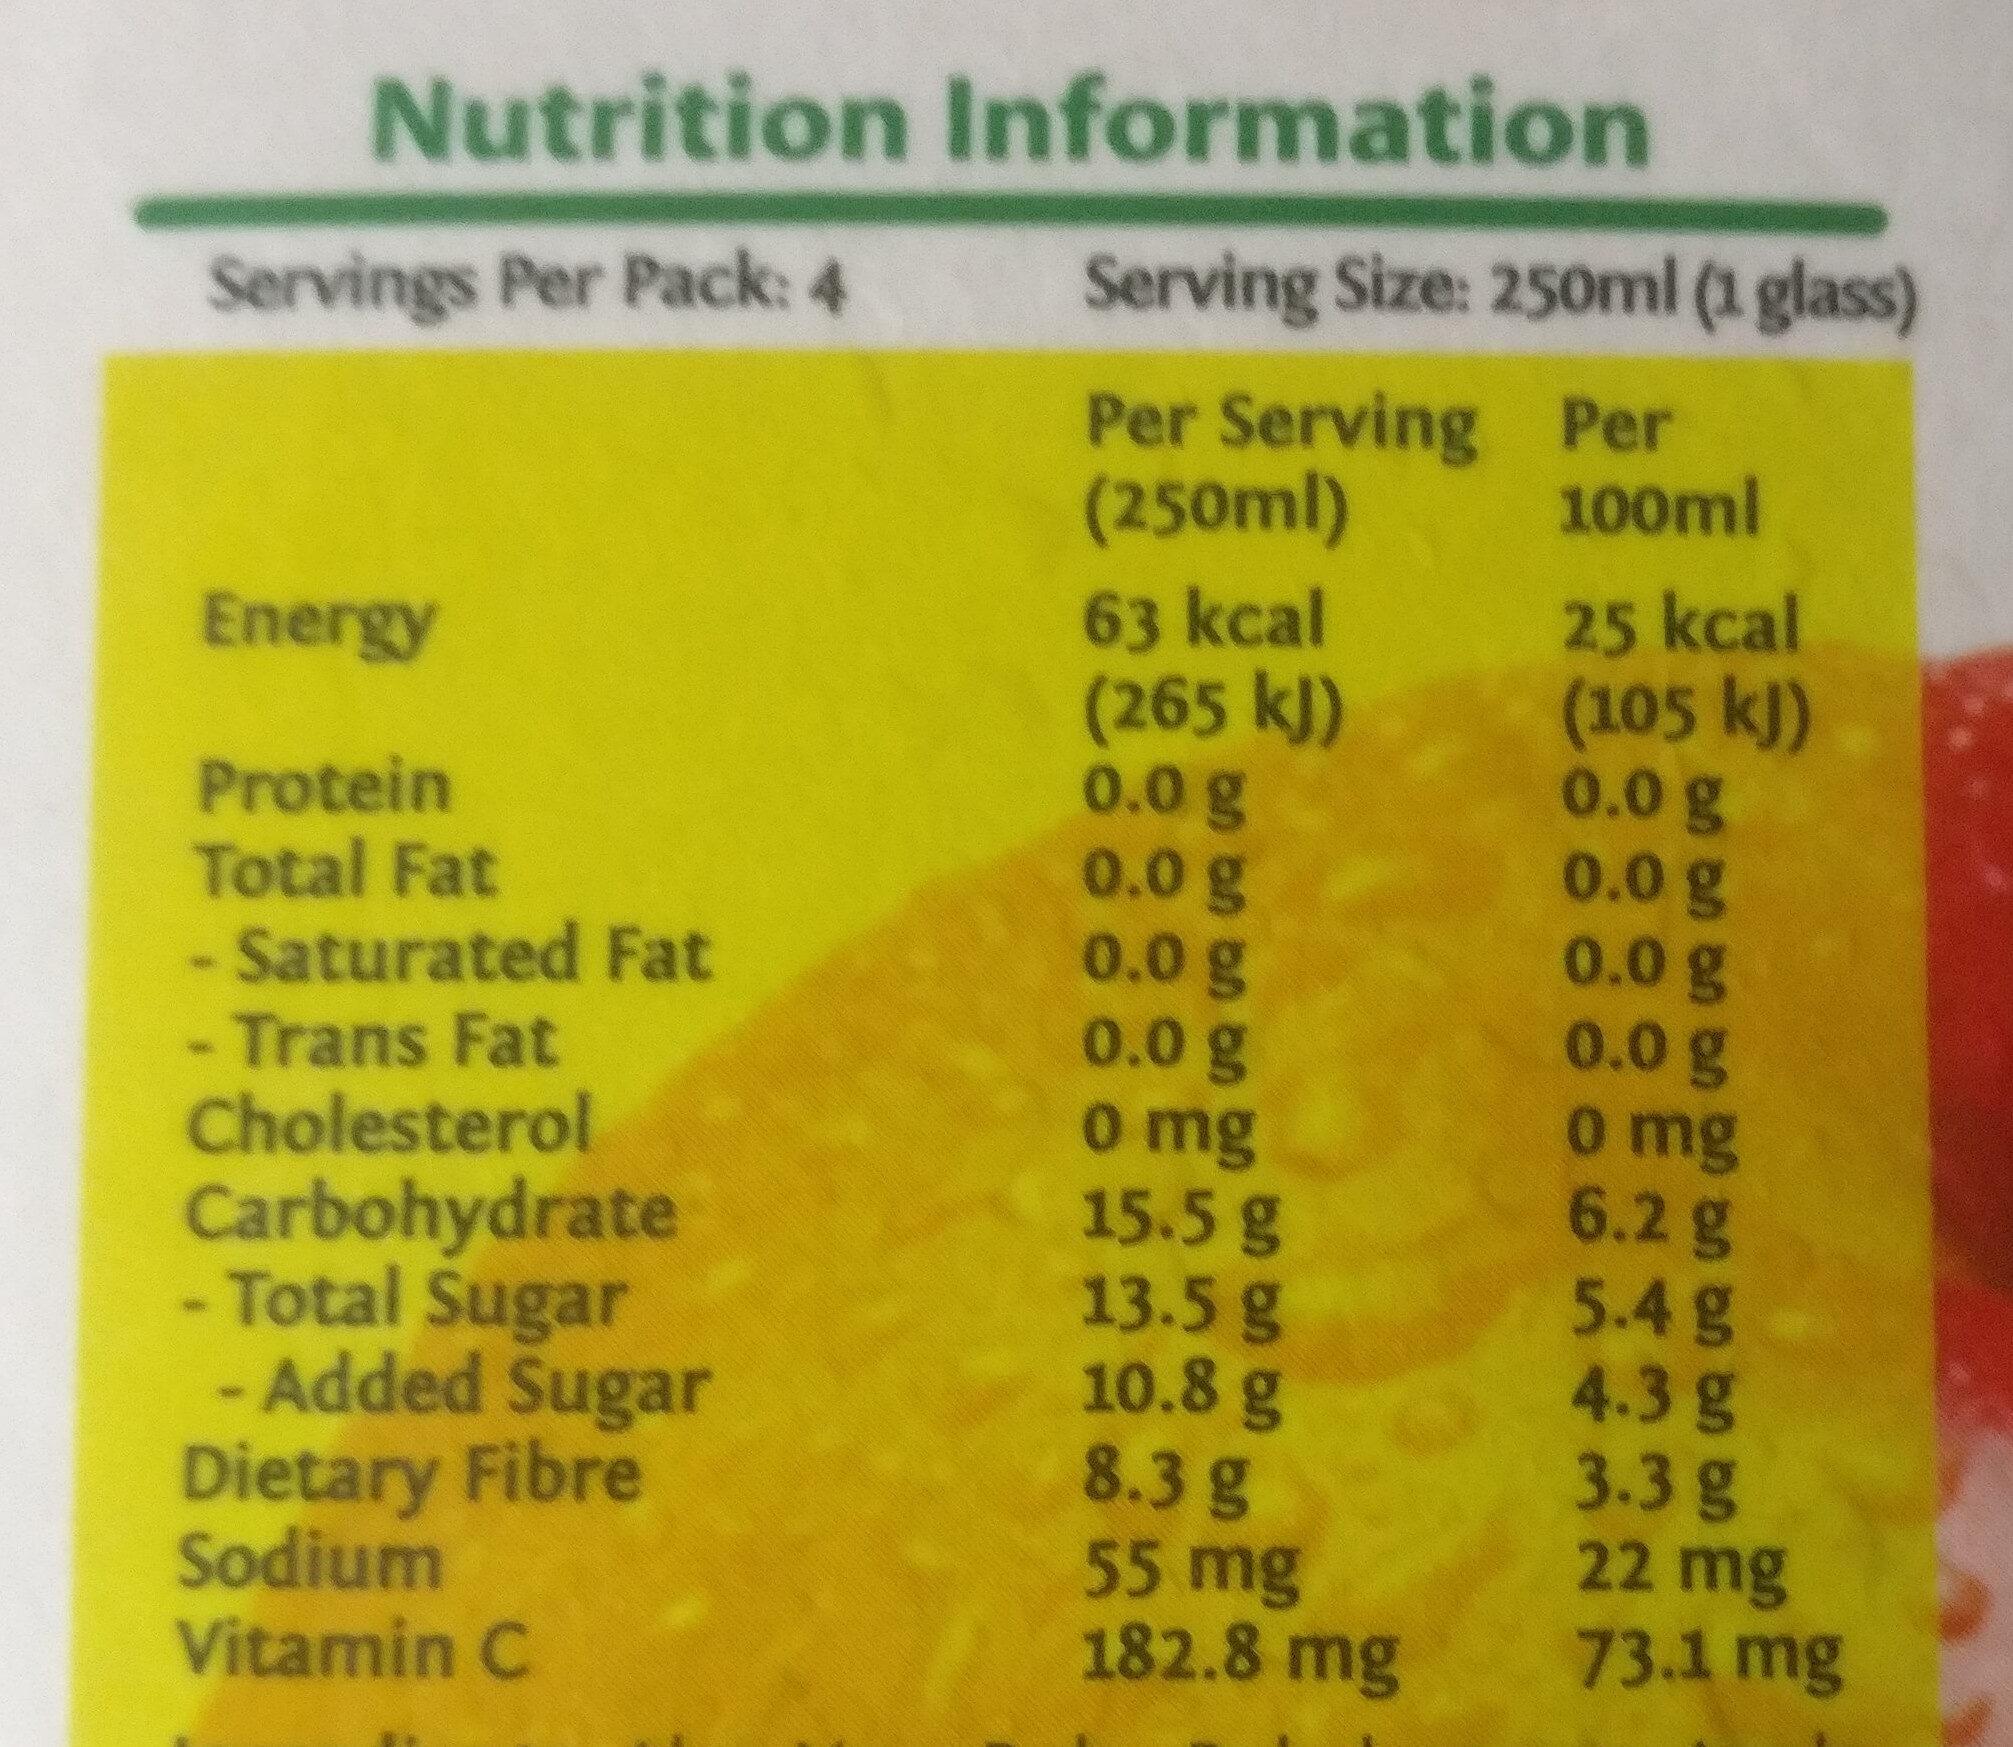 Peel Fresh Less Sugar Apple Aloe Vera Juice Drink - Nutrition facts - en